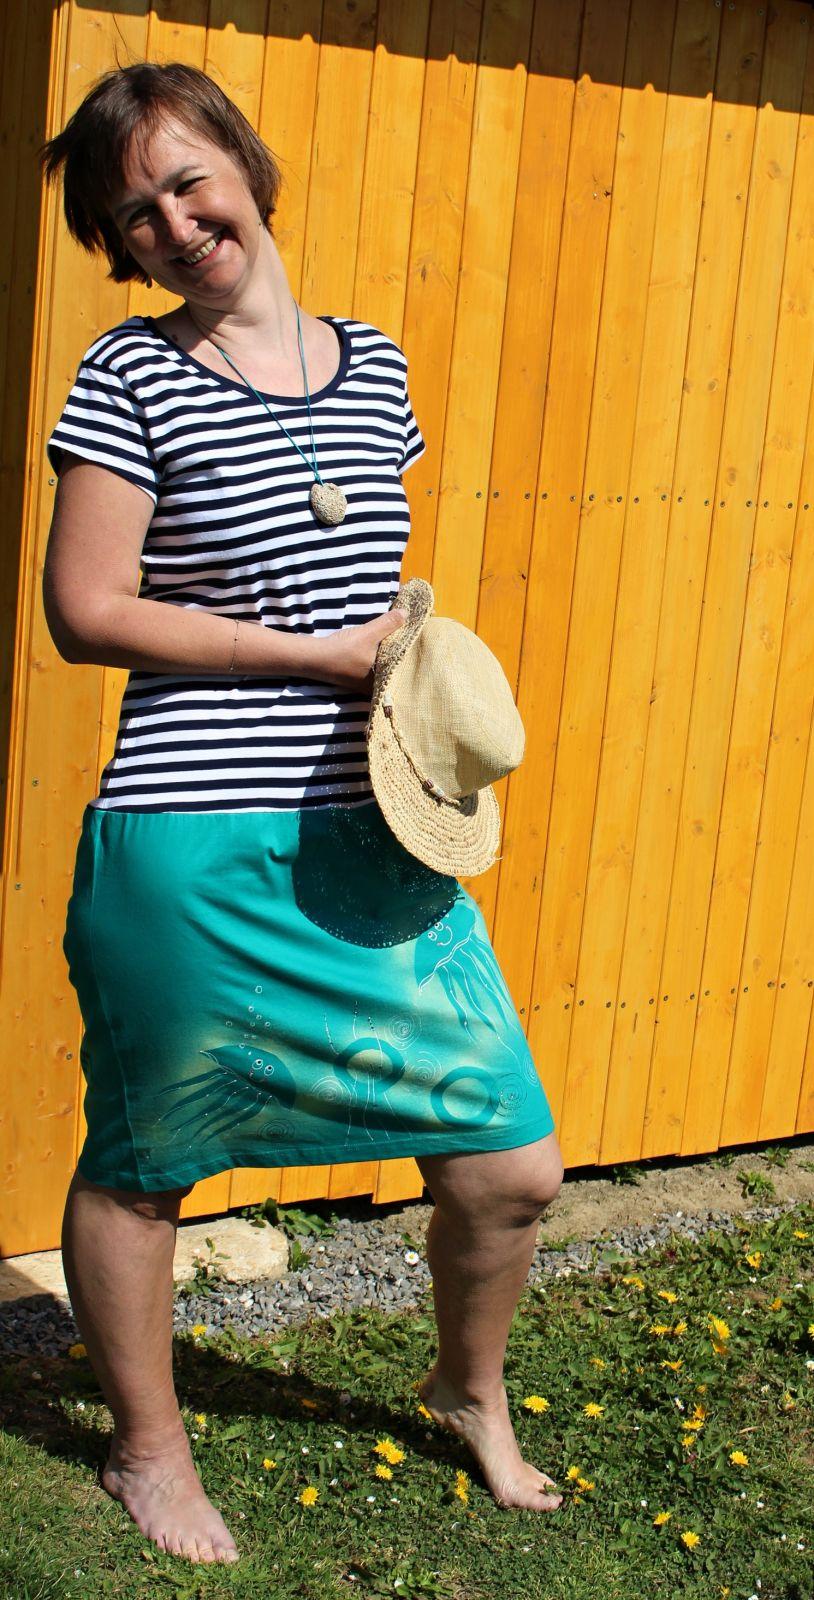 Malované, batikované šaty - Mořský svět Batitex - malovaná, batikovaná trička, šaty, mikiny, šátky, šály, kravaty